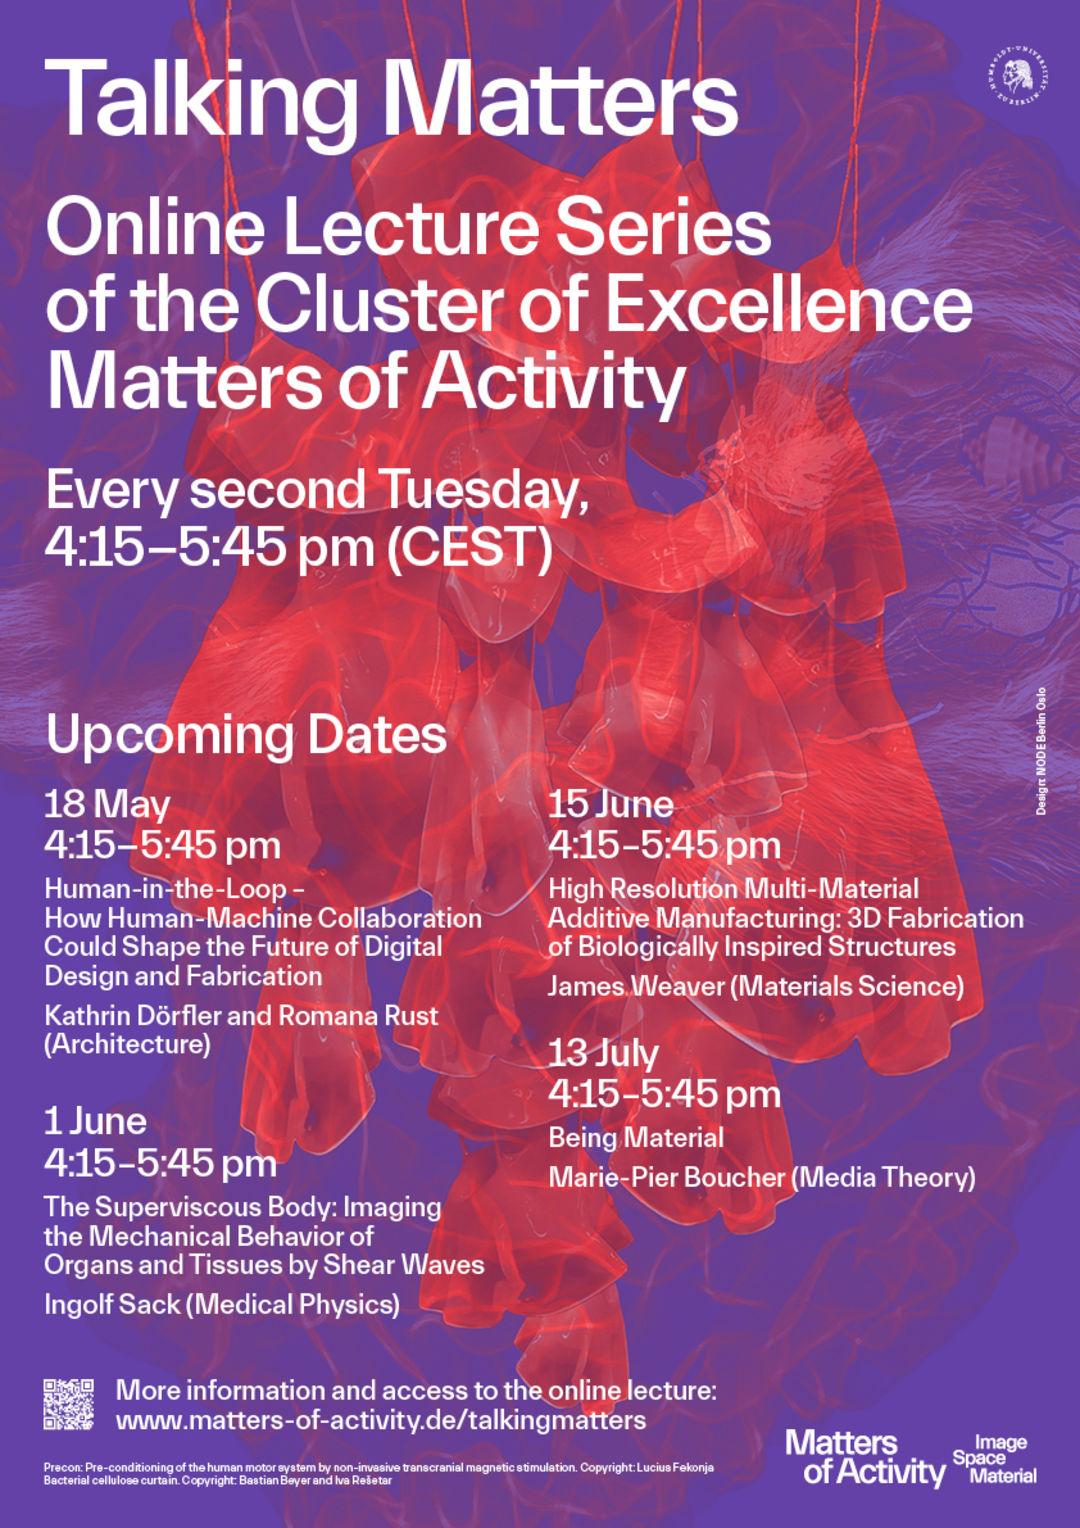 Poster Online Lecture Series »Talking Matters«, Copyright: Lucius Fekonja, Bastian Beyer, Iva Rešetar, adapted by NODE Berlin